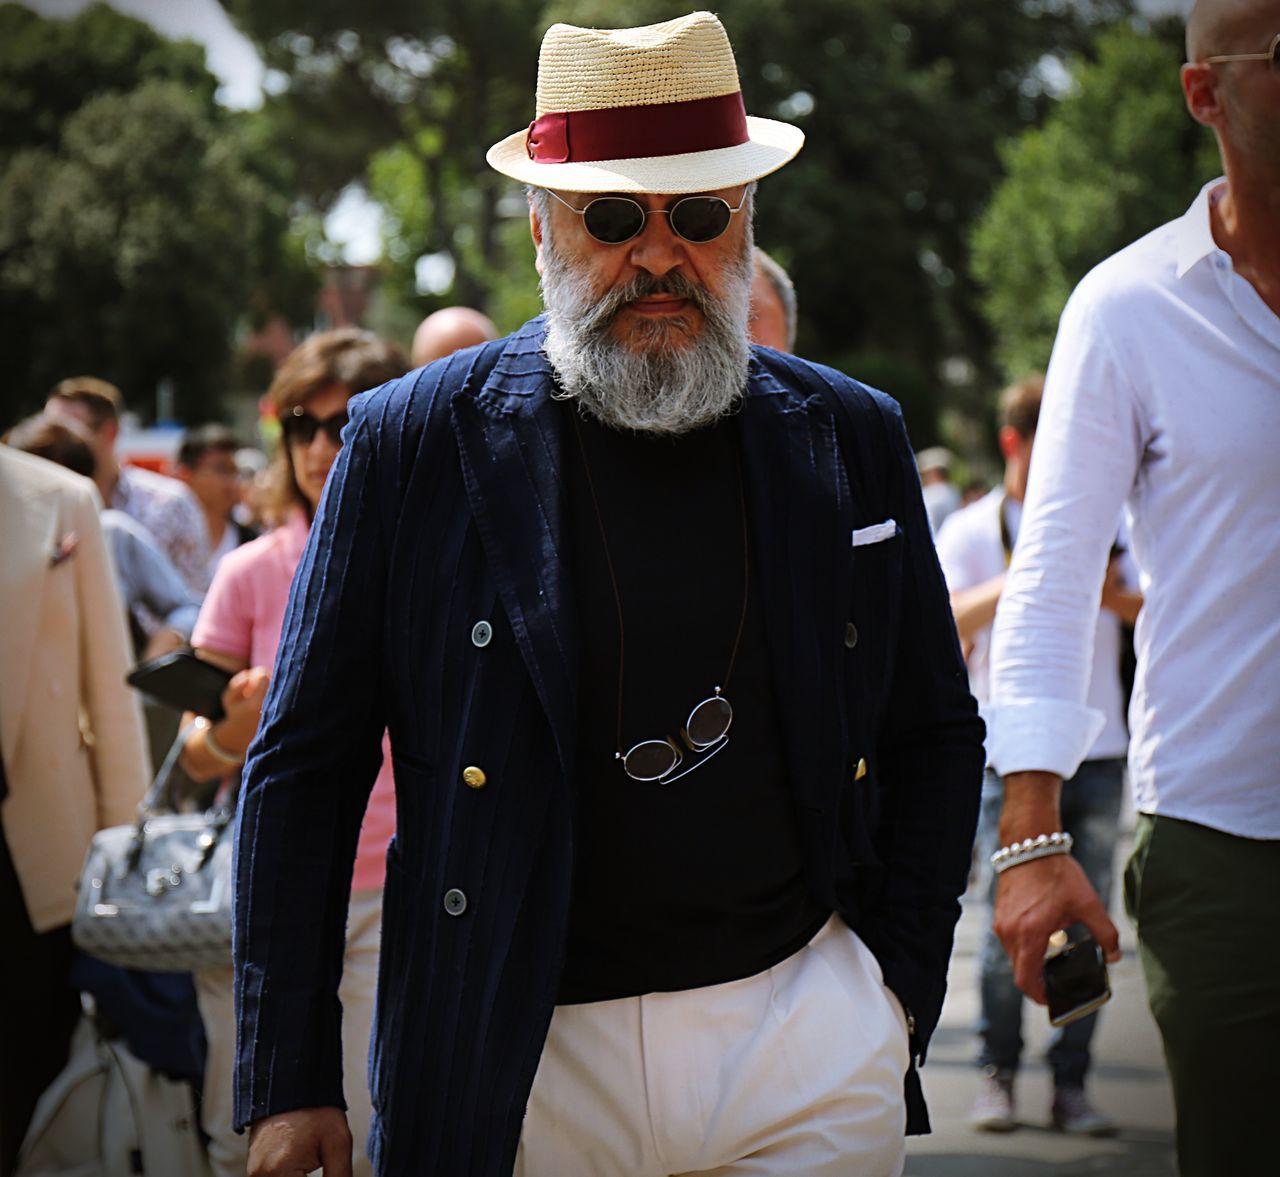 senior adult, senior men, real people, focus on foreground, outdoors, casual clothing, beard, men, day, lifestyles, standing, eyeglasses, people